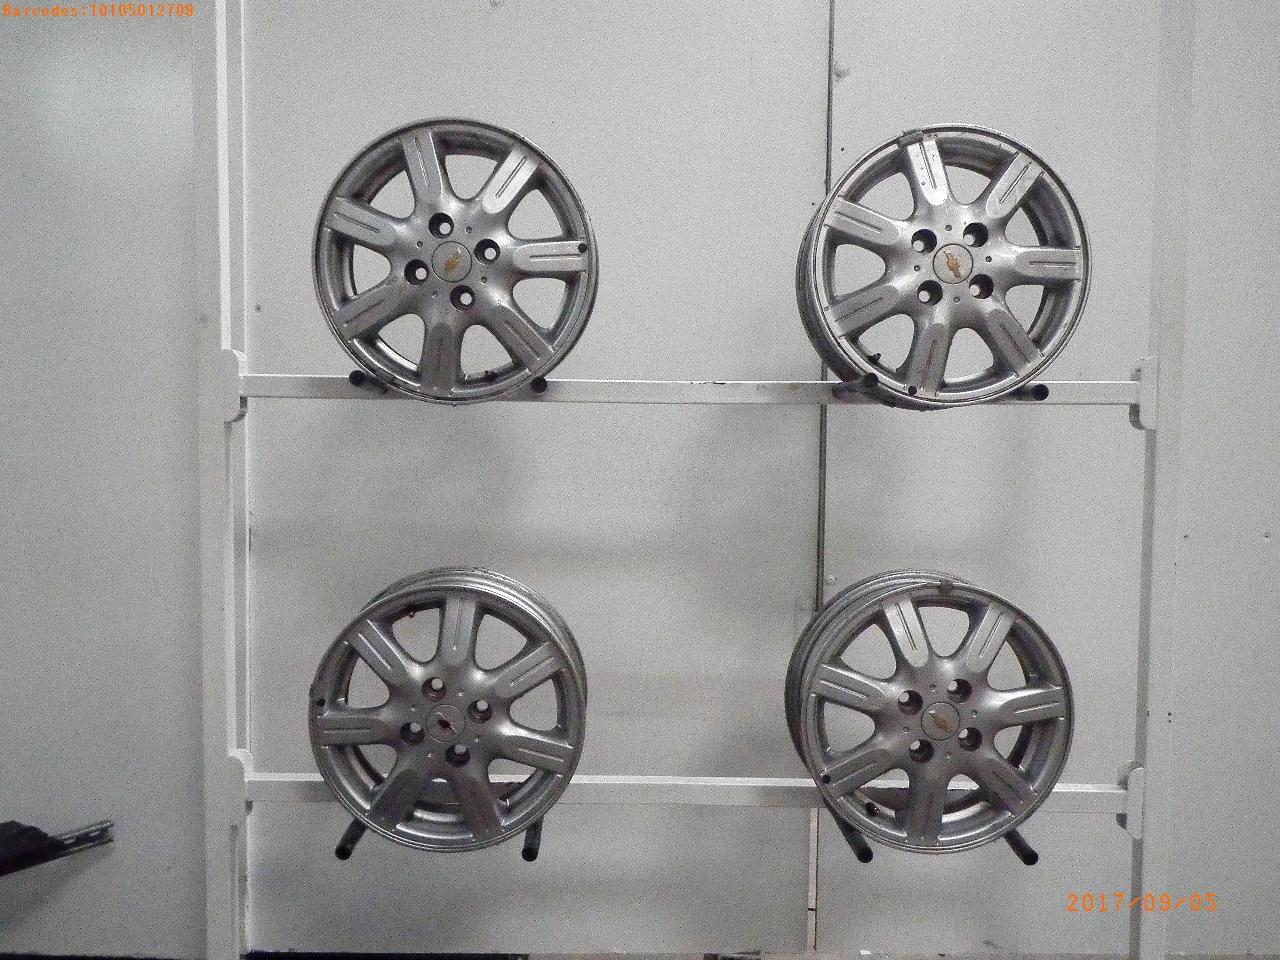 Jante Chevrolet Spark M300 1 2 4 1 2 X 14 1 Satz 4 Stk B Parts